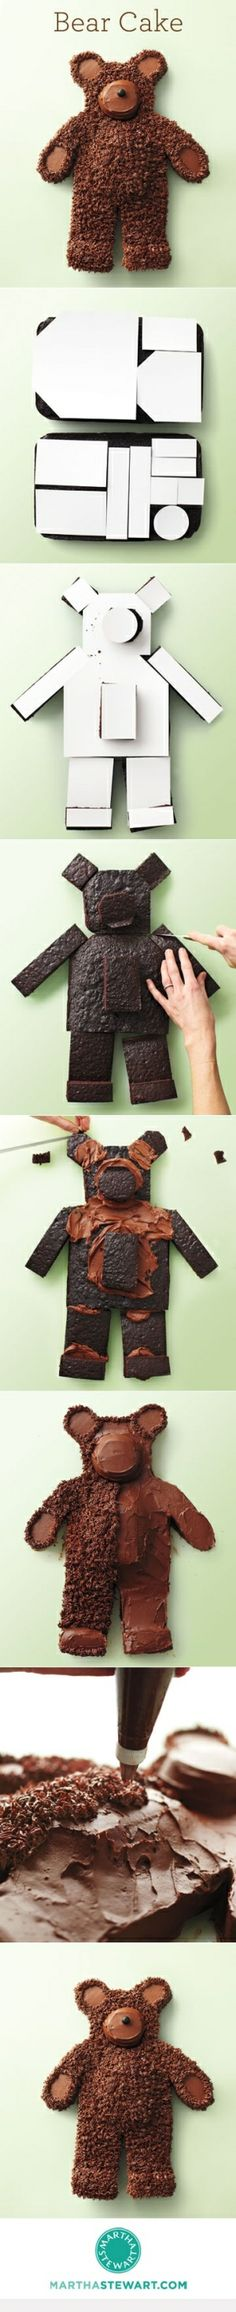 bear cake by Kim Paige